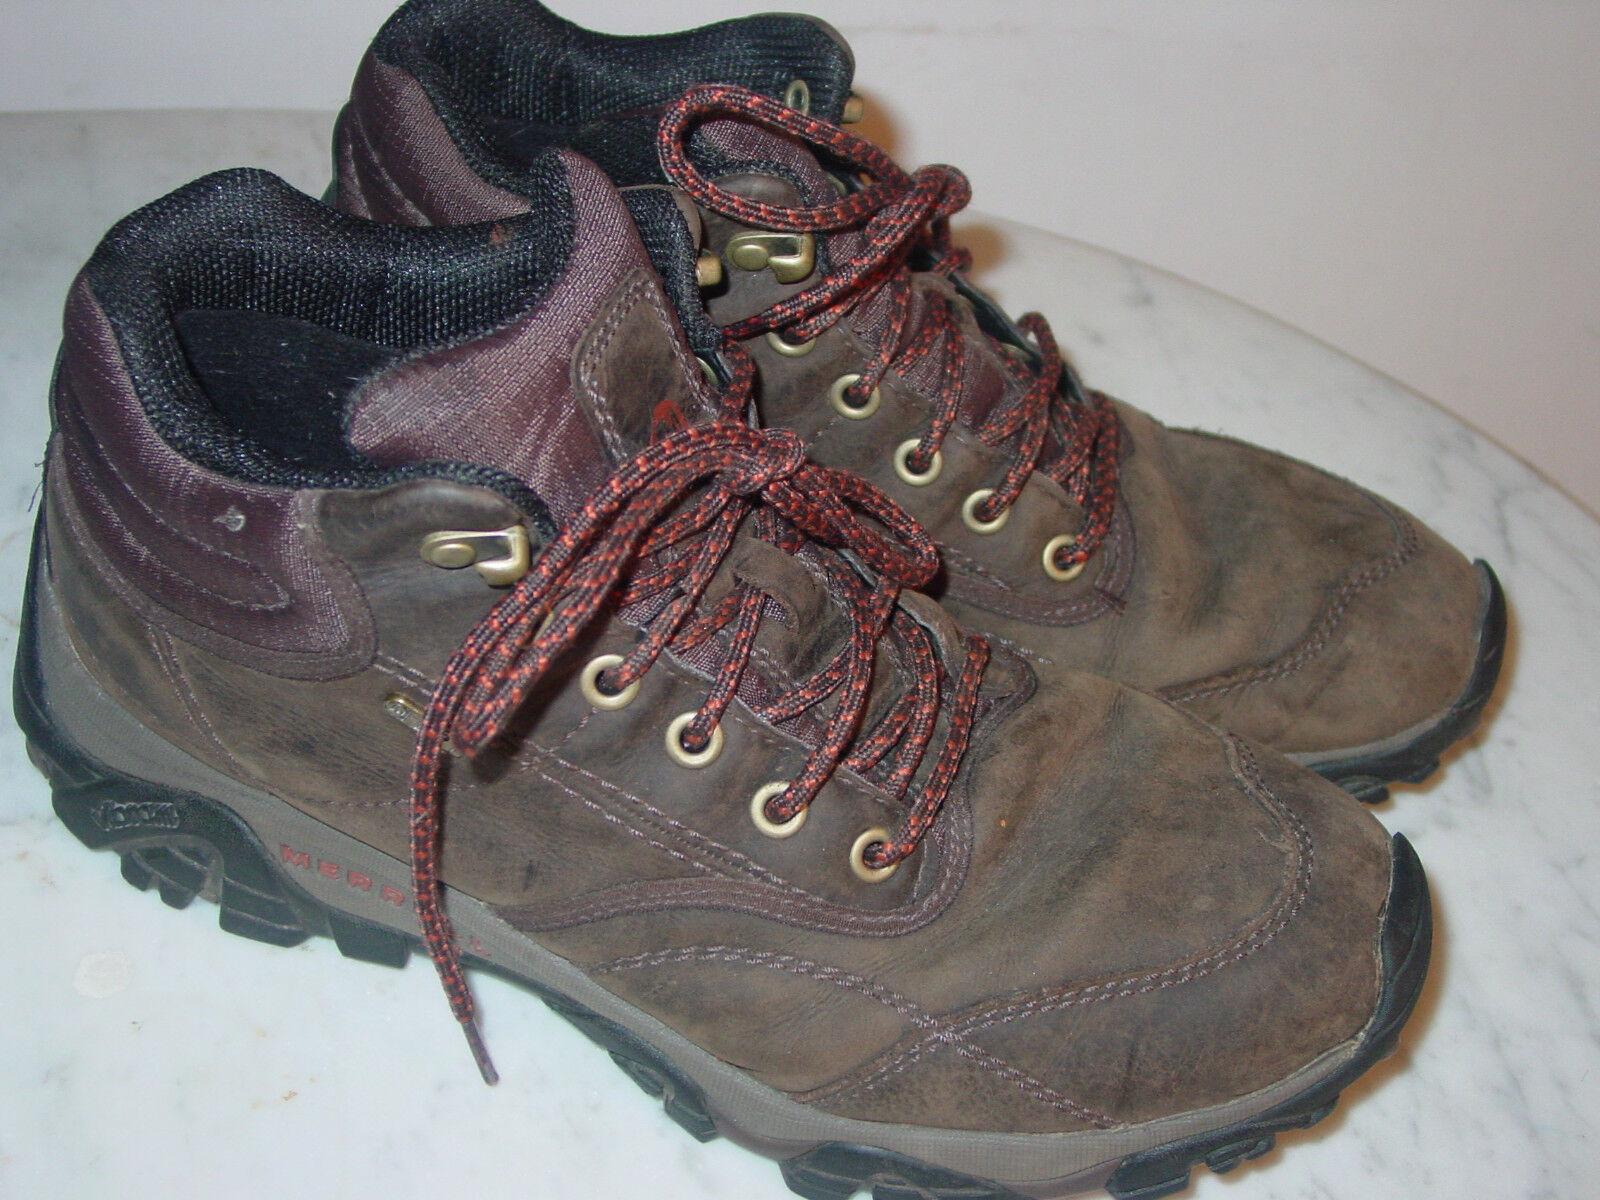 Merrell Moab Rover Mens Hiking Shoes UK